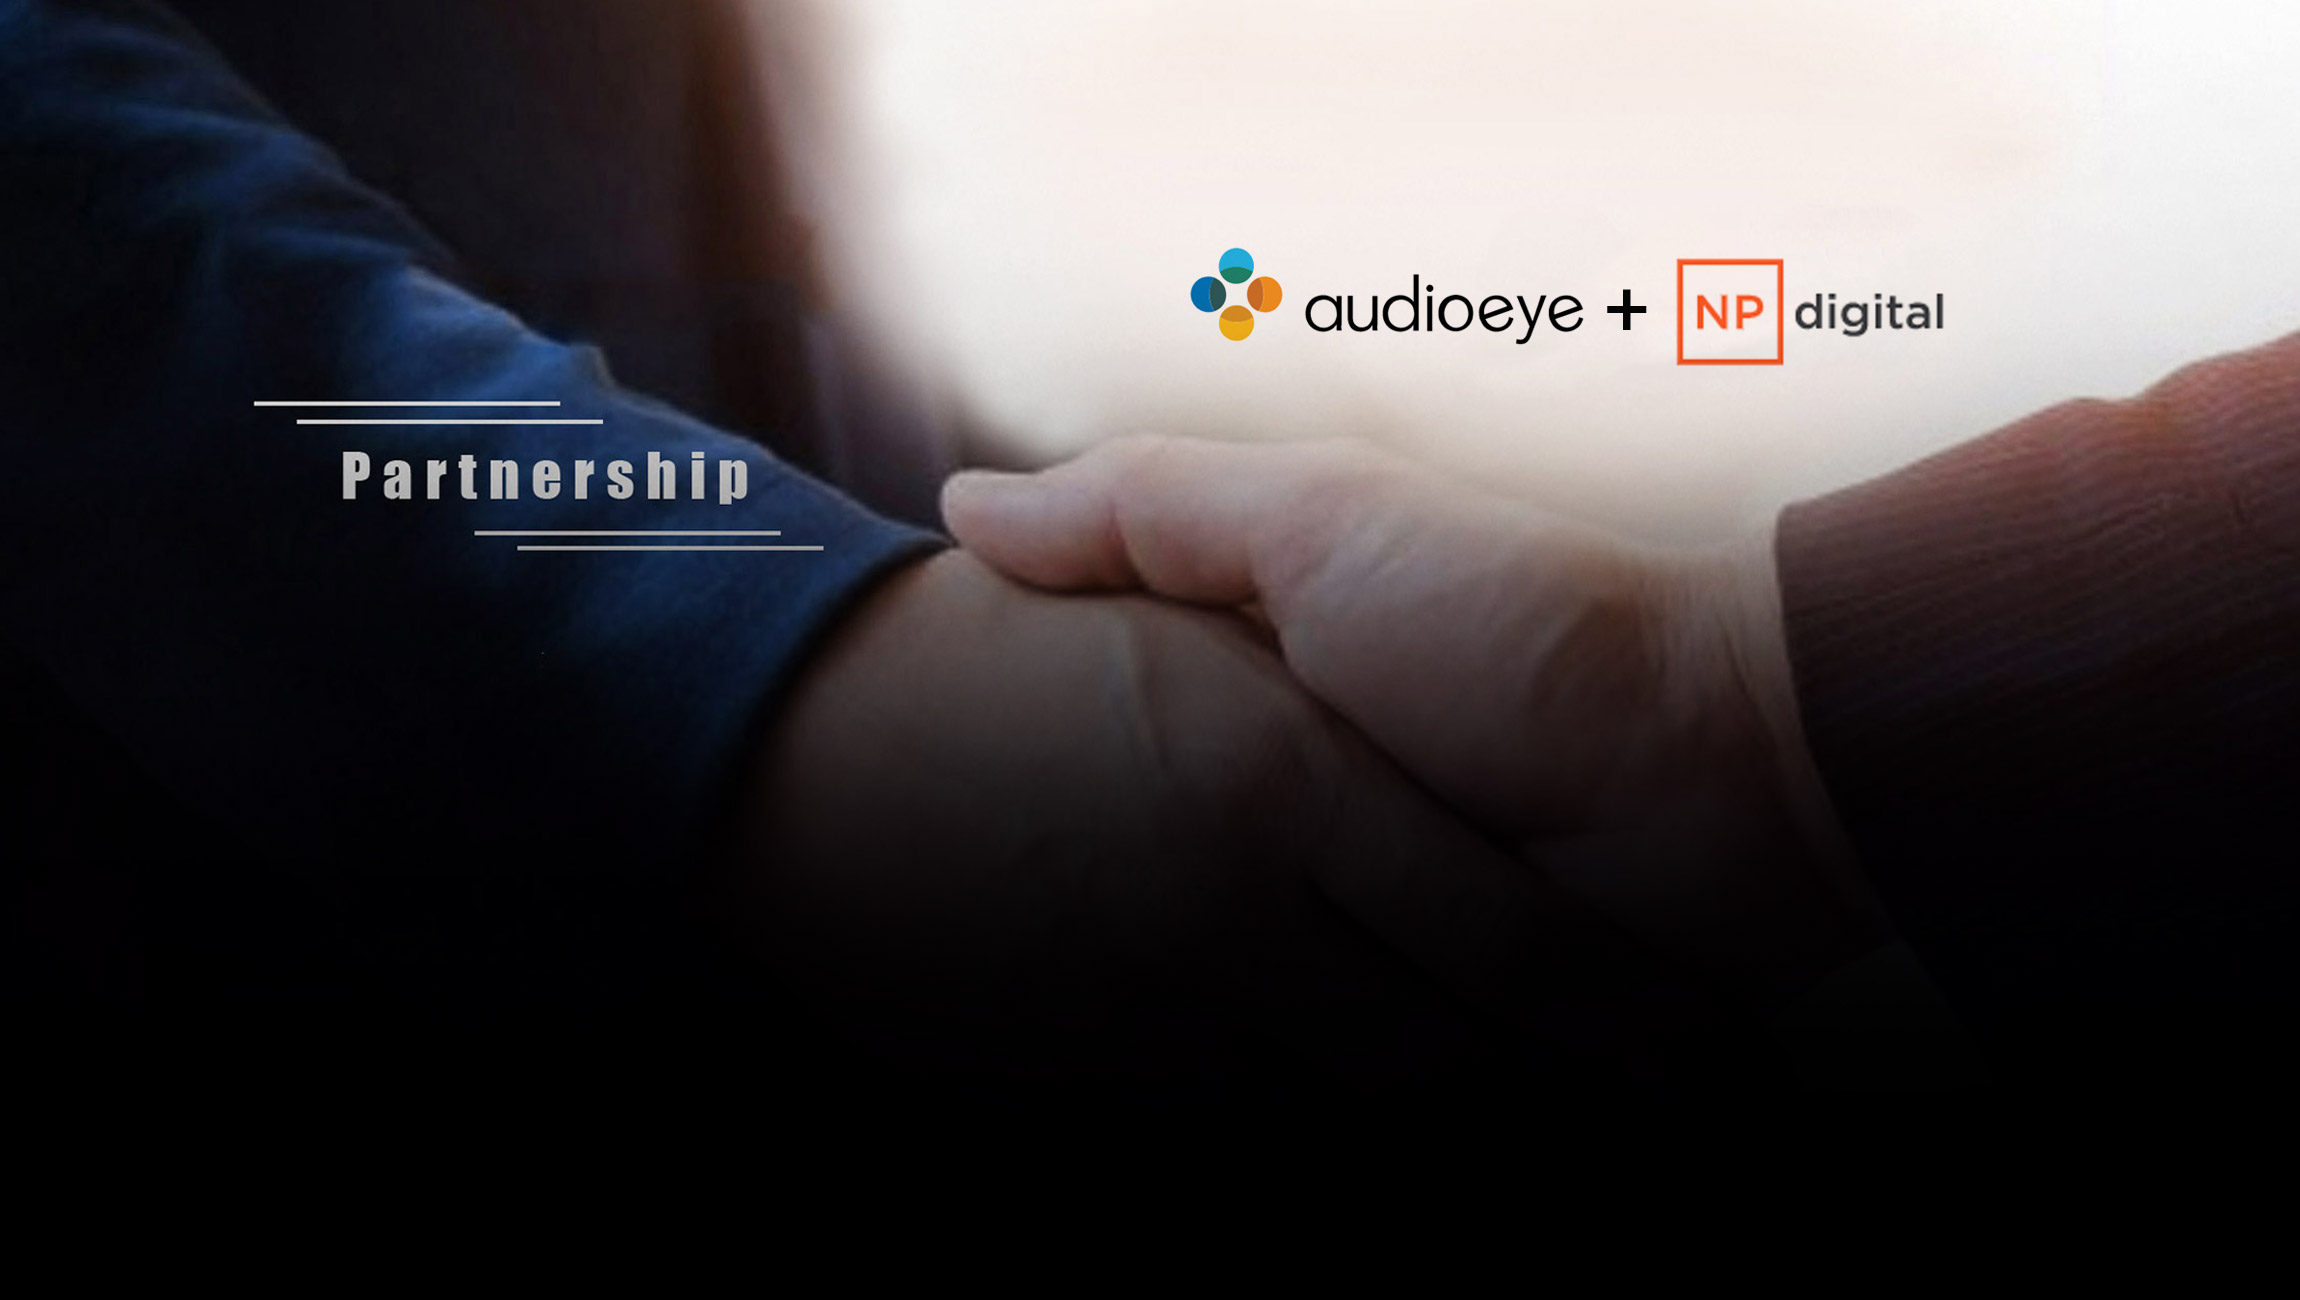 AudioEye and Neil Patel Digital Announce Strategic Partnership